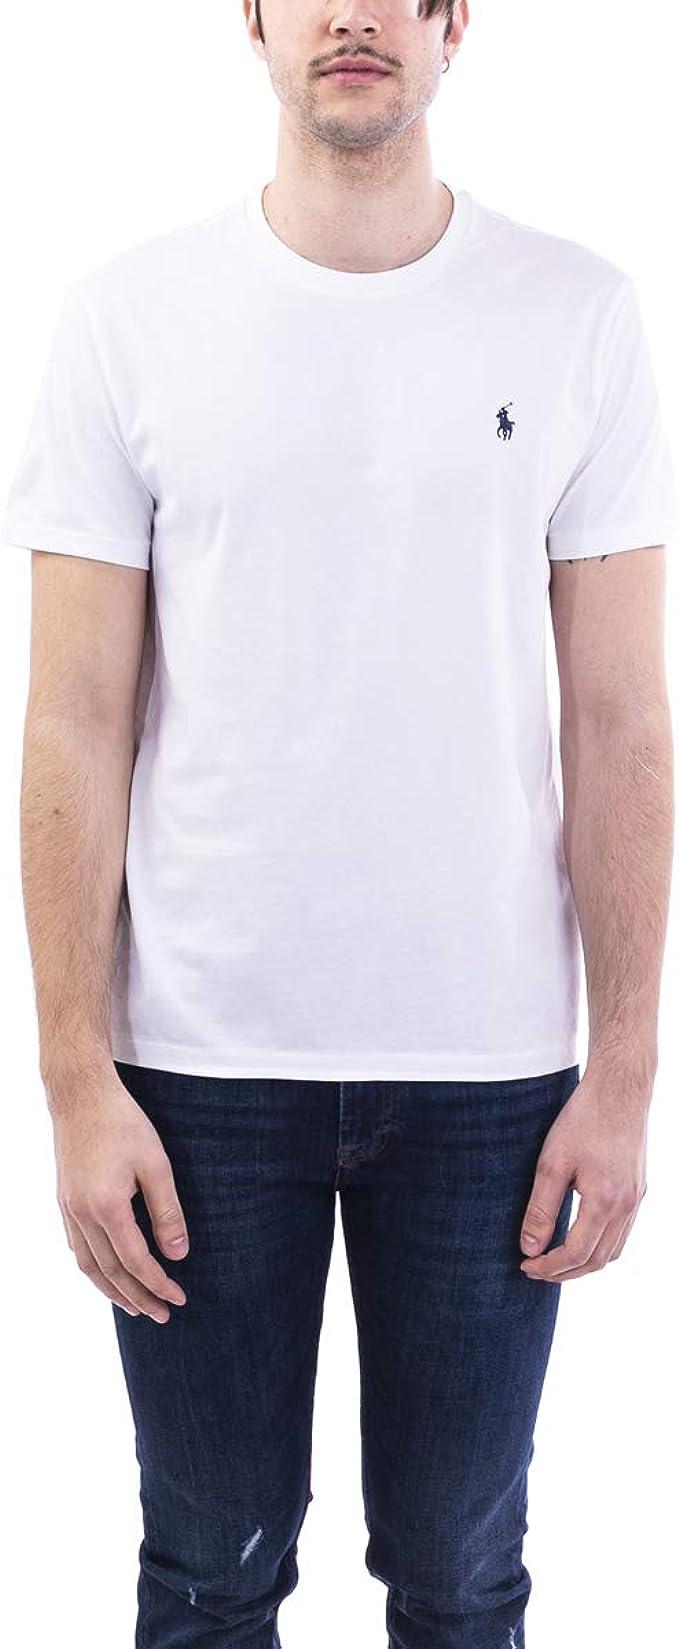 Polo Ralph Lauren tee-Shirts Camiseta para Hombre: Amazon.es: Ropa y accesorios